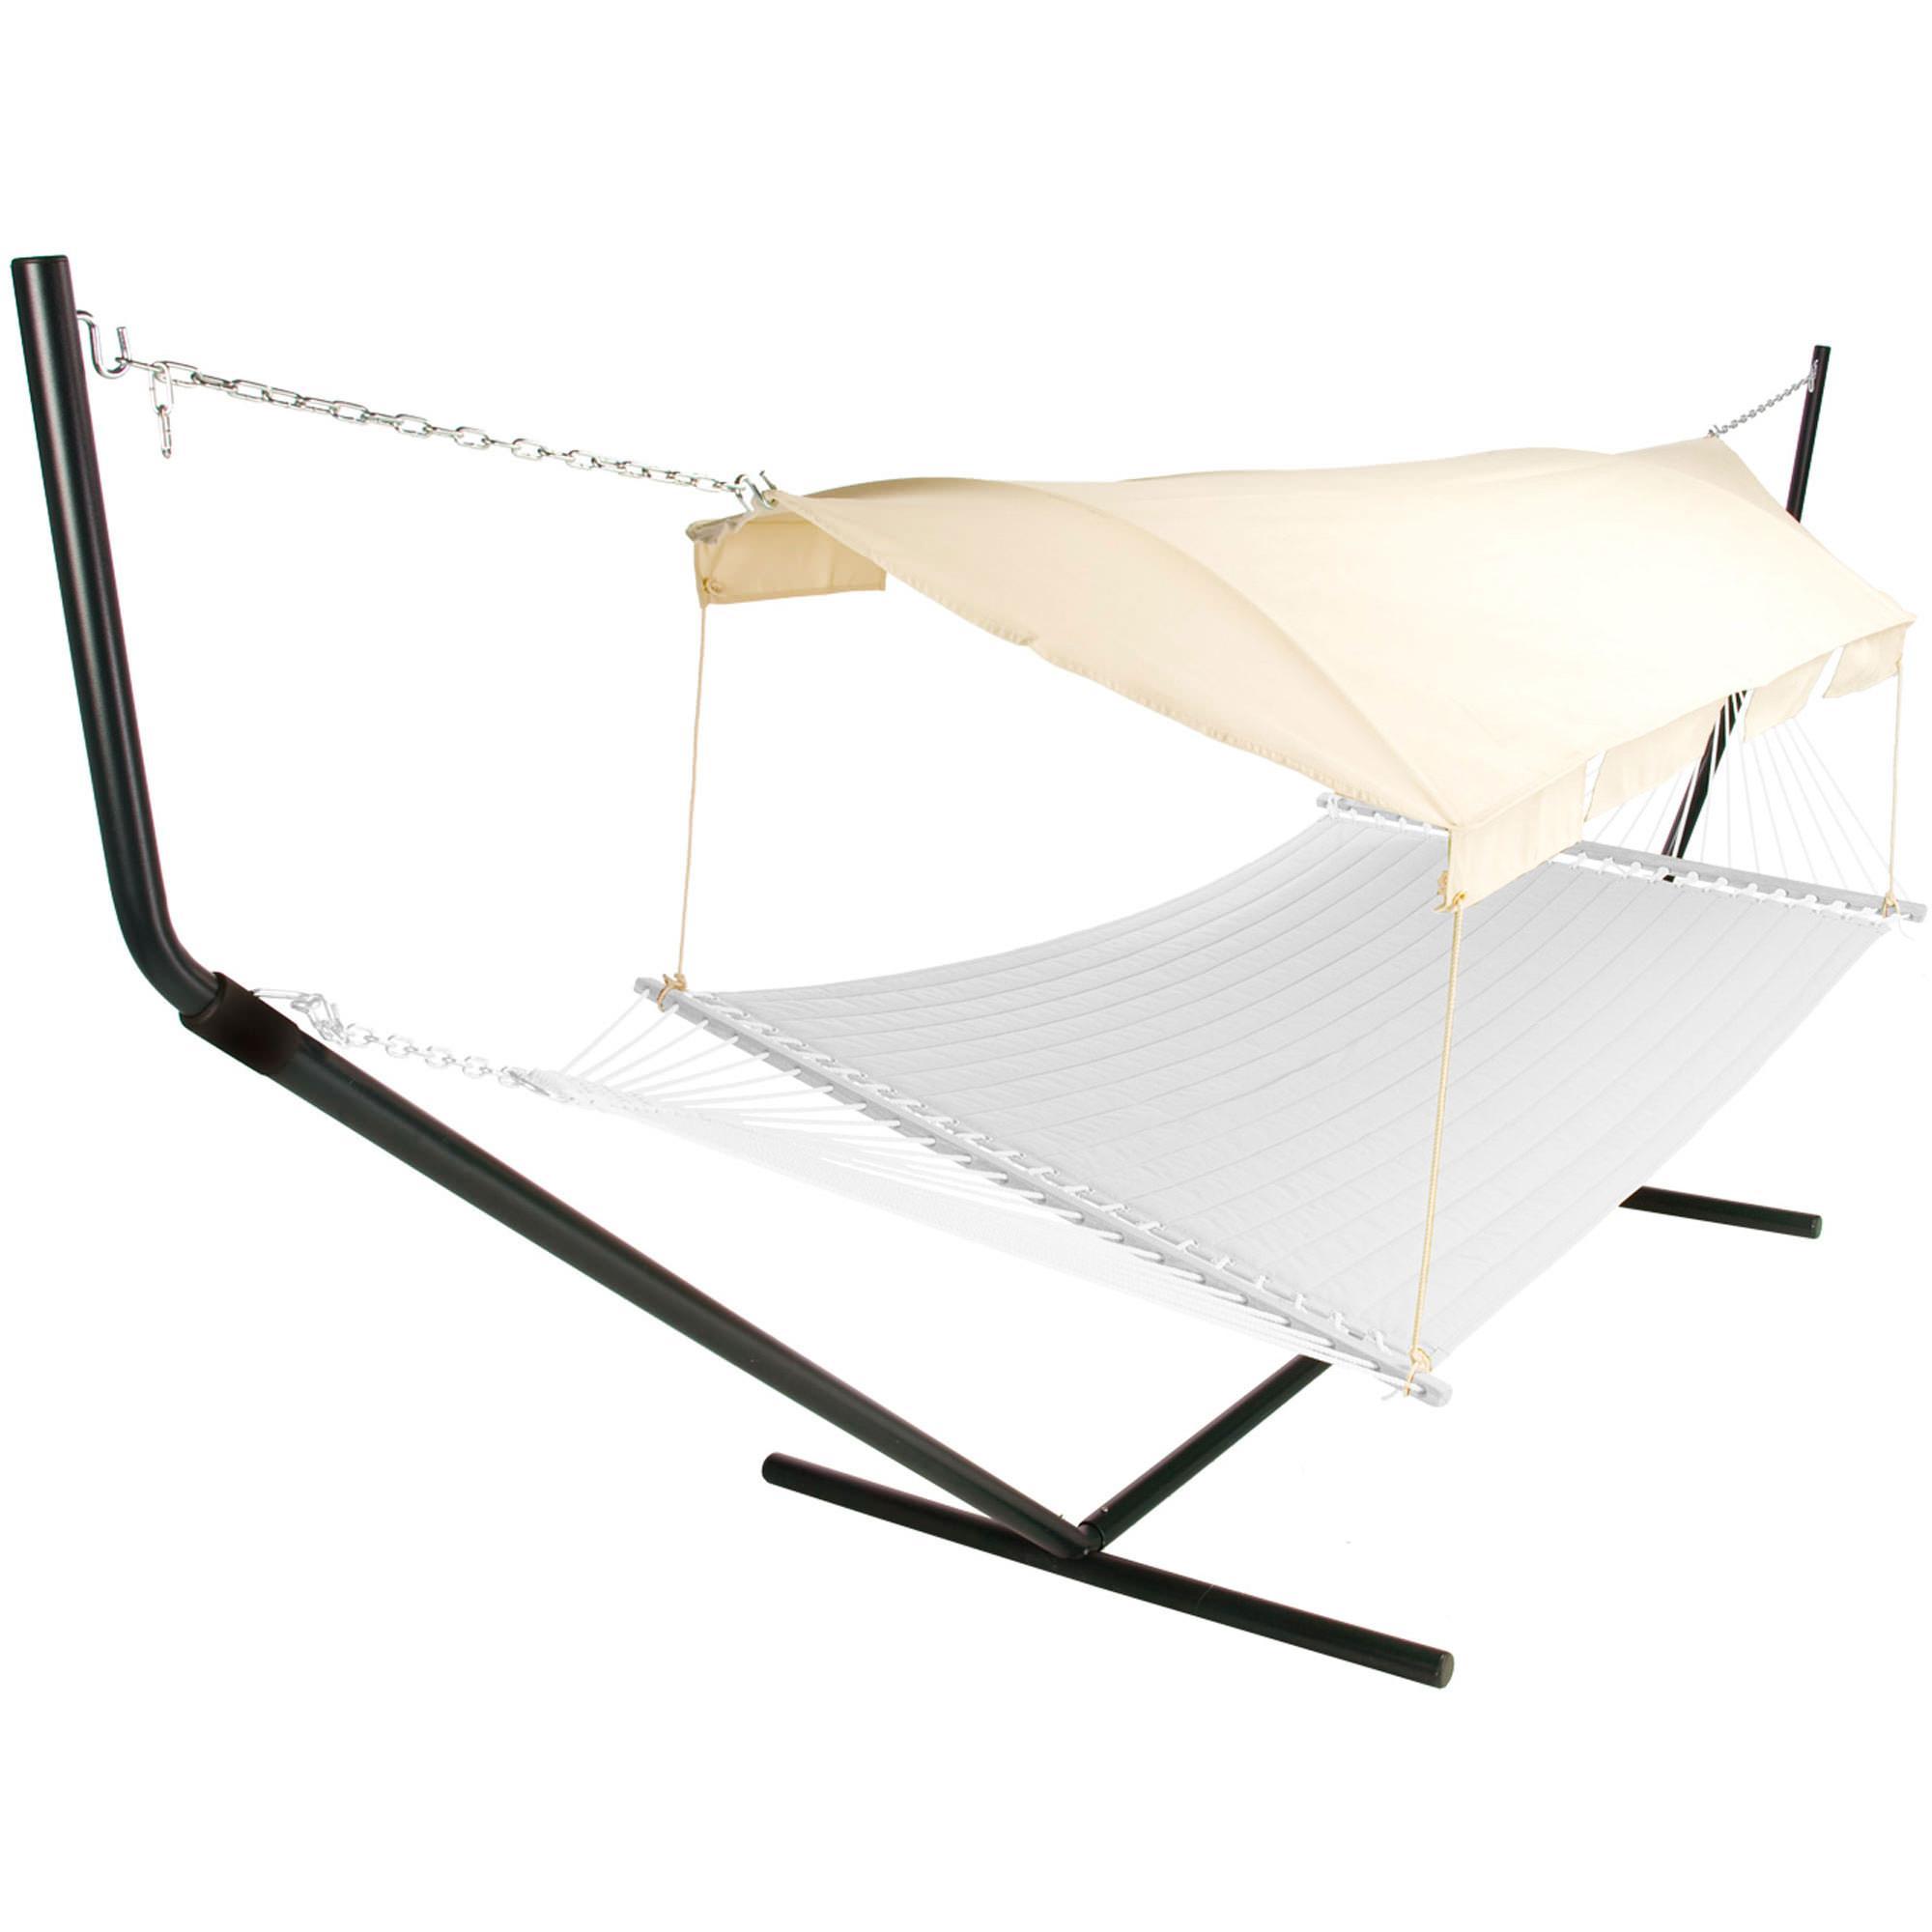 hammock canopy   black black hammock canopy on sale   cpy bktx  rh   hatterashammocks